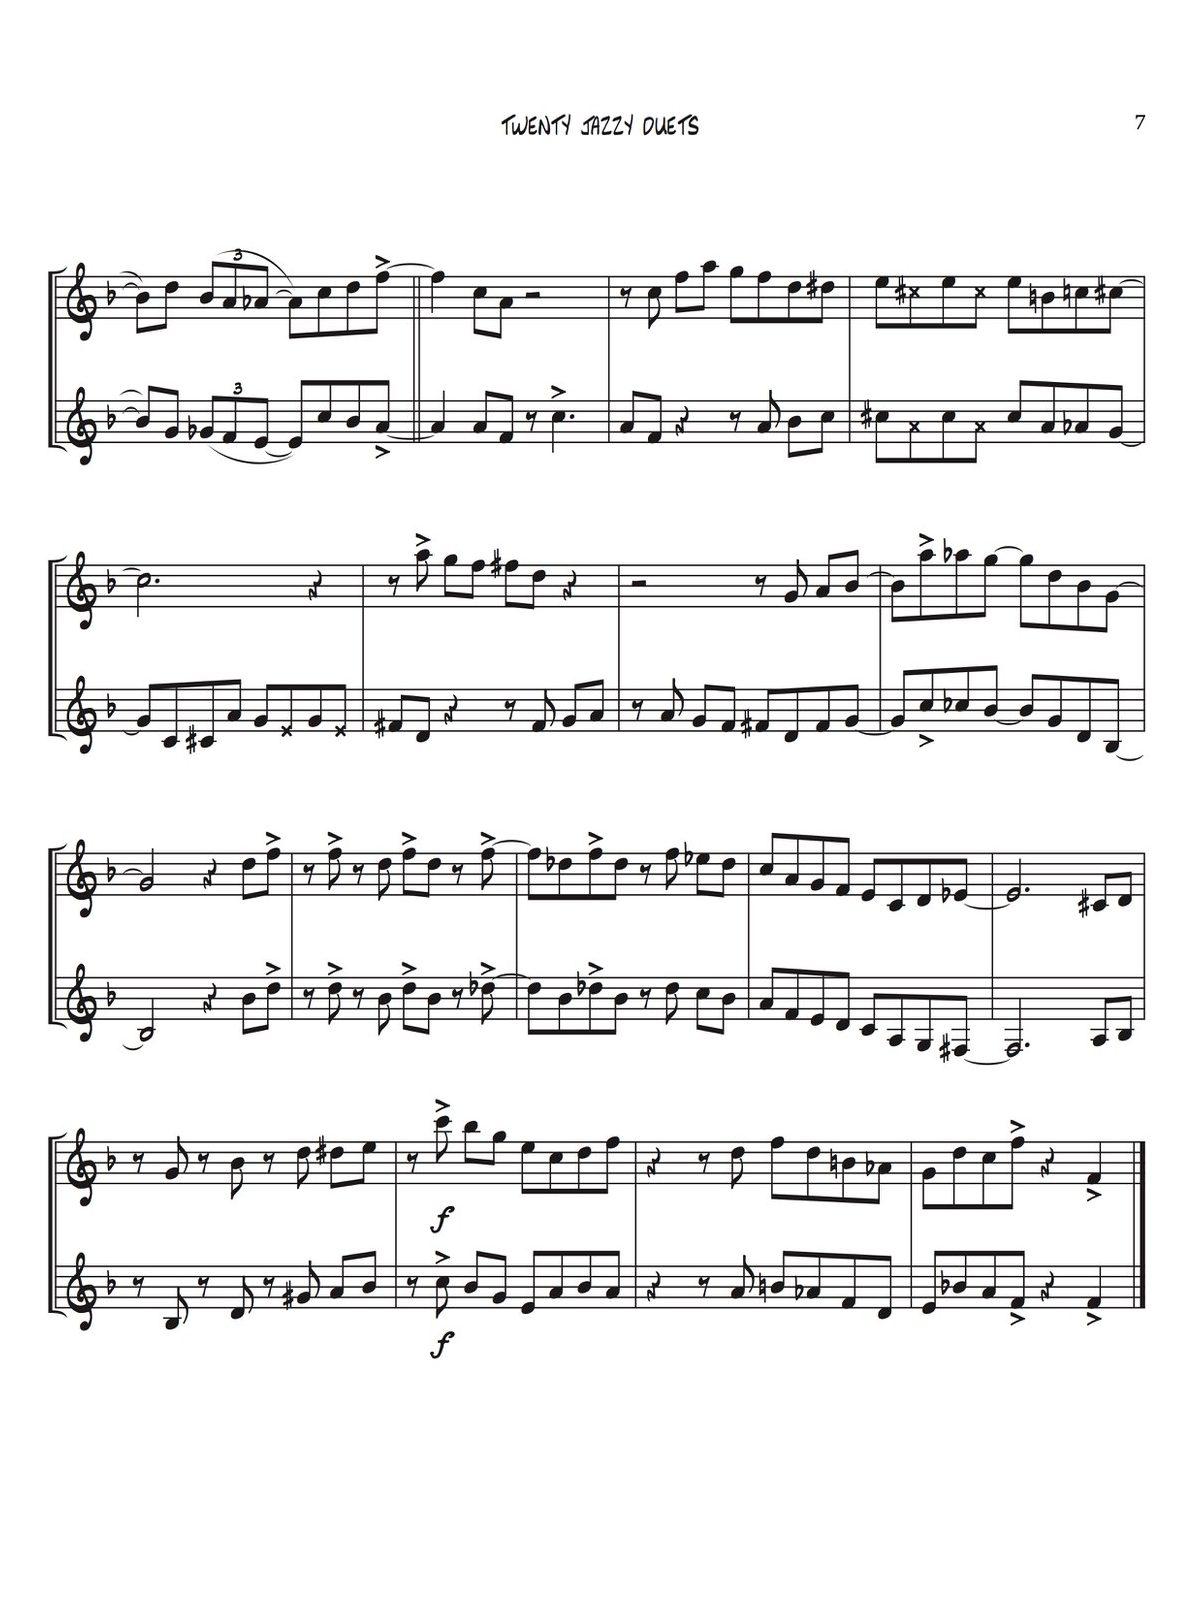 Veldkamp, 20 Jazzy Duets-p07